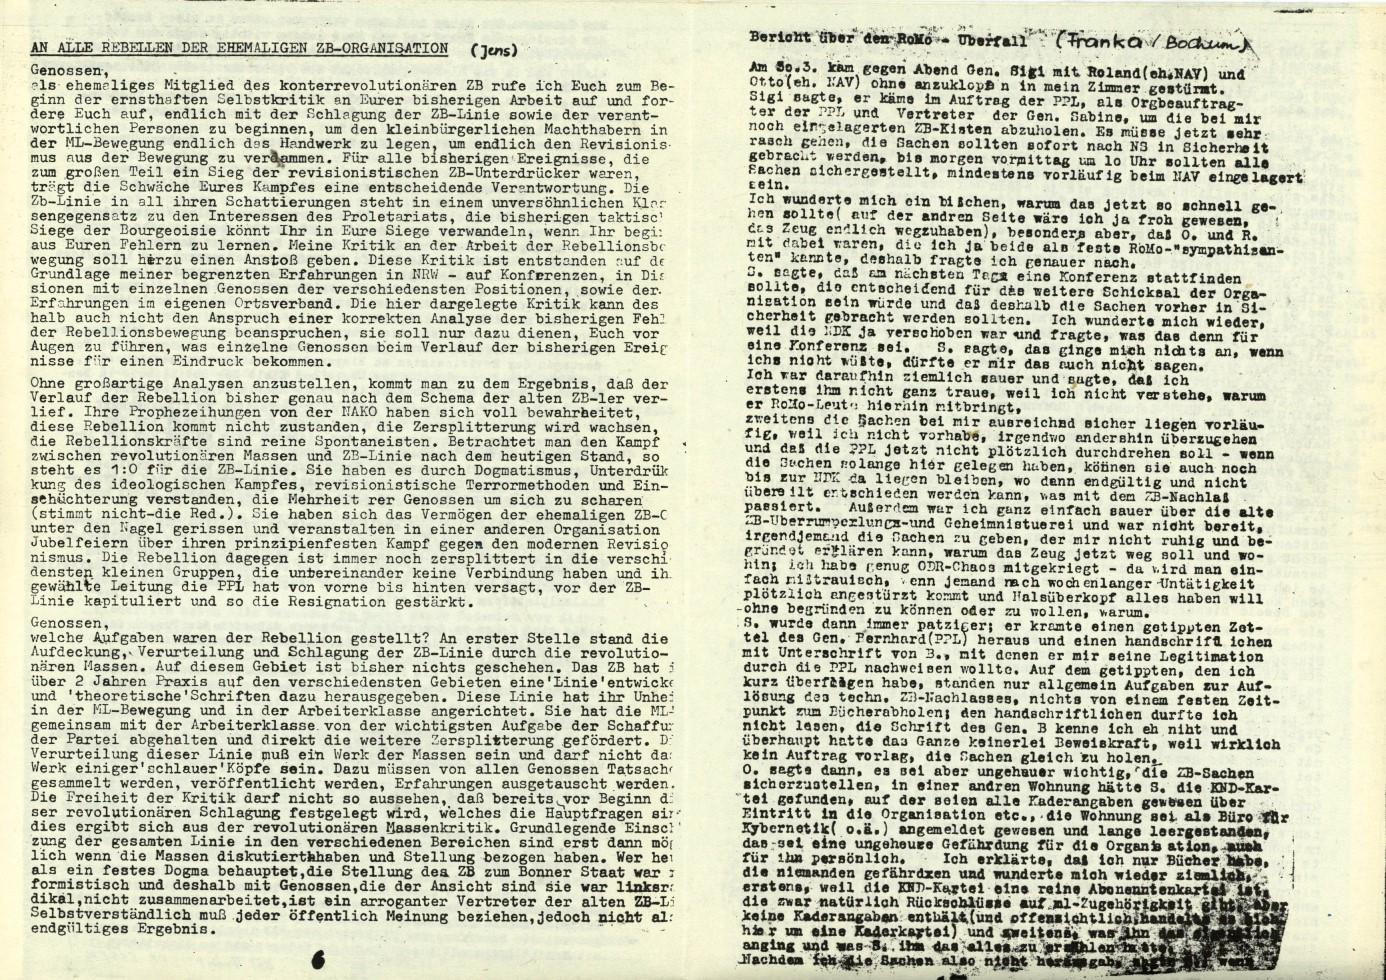 ZB_Rebellionsbewegung_Diskussionsorgan_19730419_05